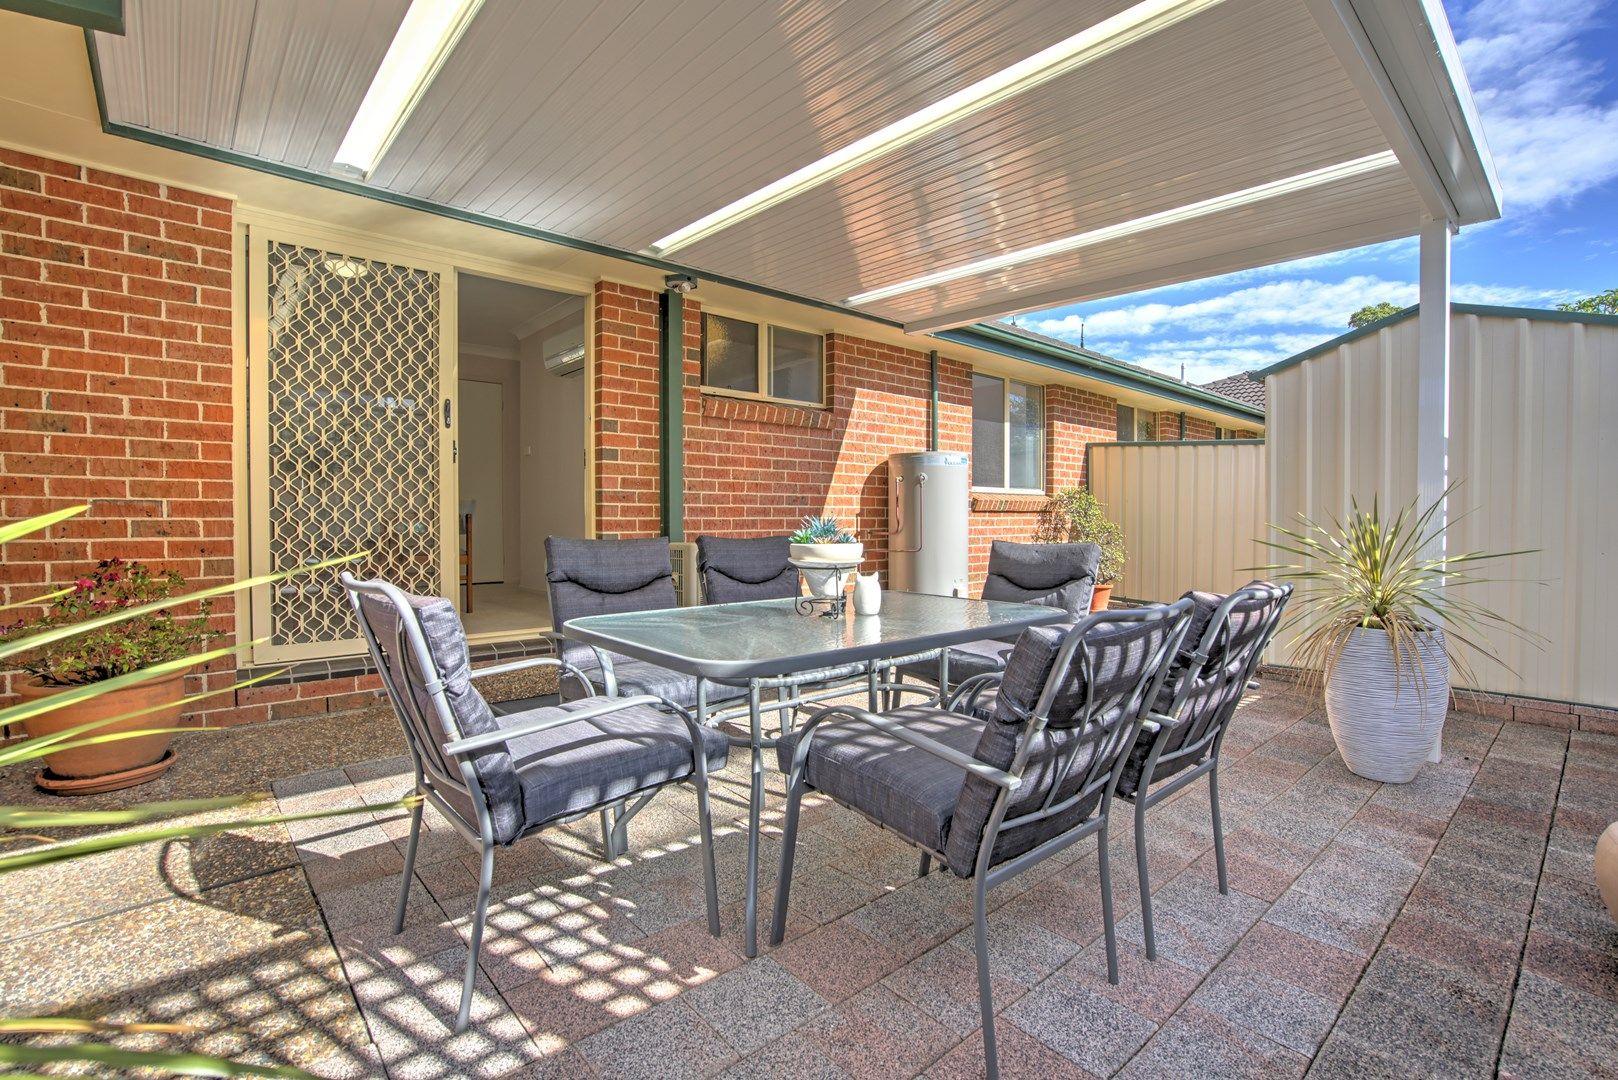 3/24 Bowden Road, Woy Woy NSW 2256, Image 1